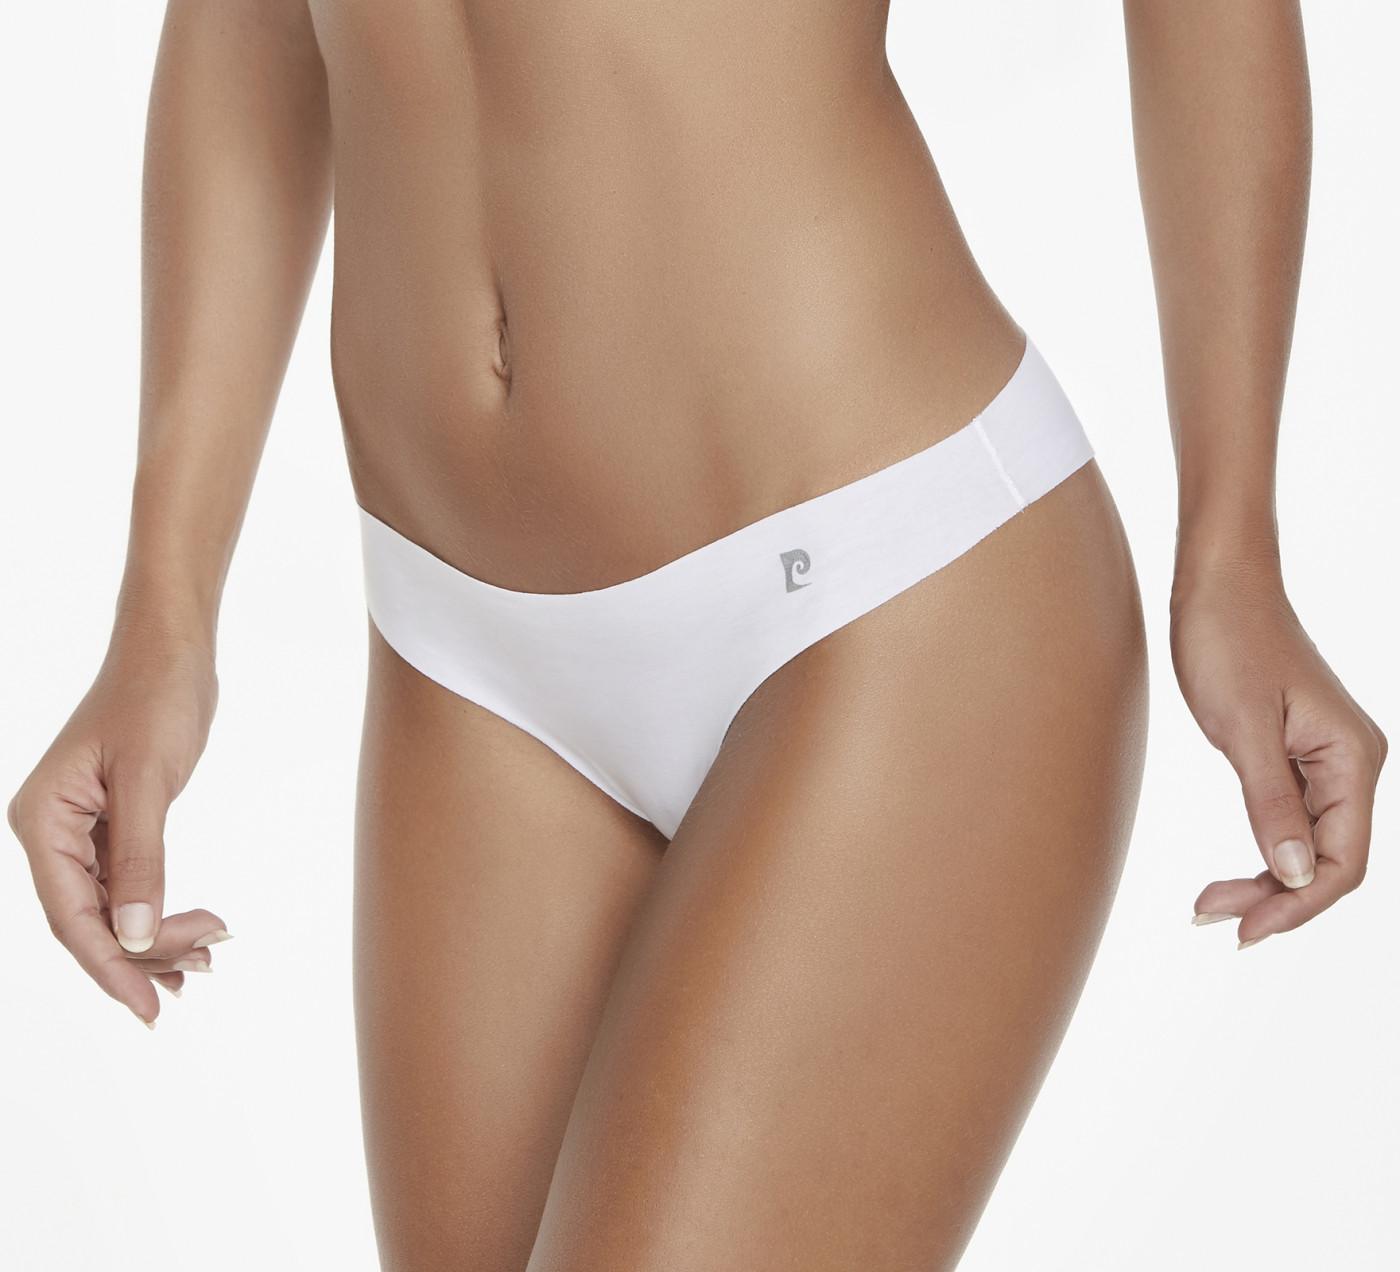 Womens panties Pierre Cardin Gloss